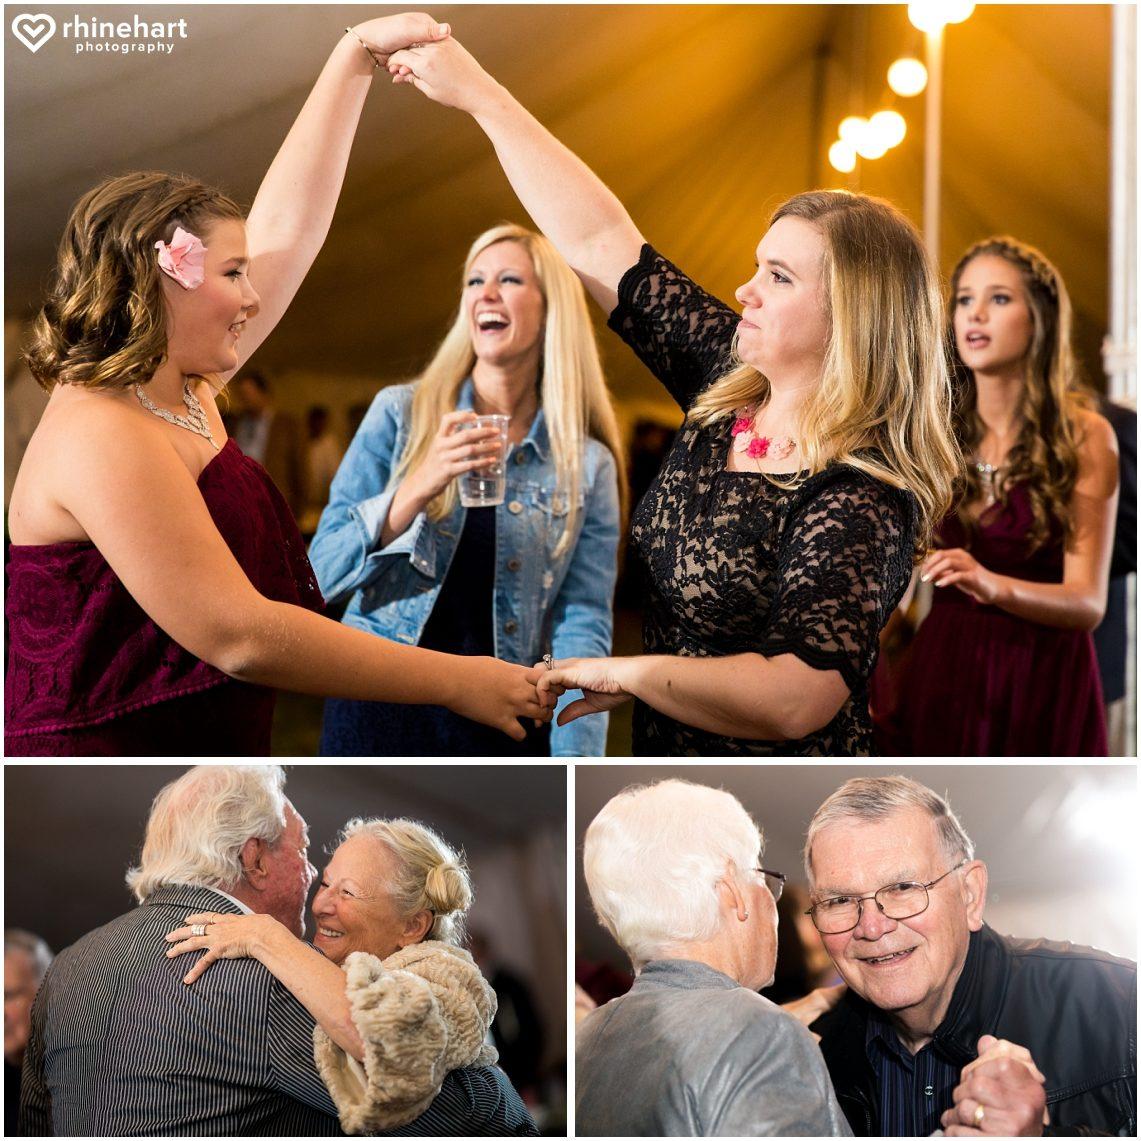 central-pa-wedding-photographers-creative-best-chambersburg-carlisle-mercersburg-gettysburg-mechanicsburg-colorful-romantic-55